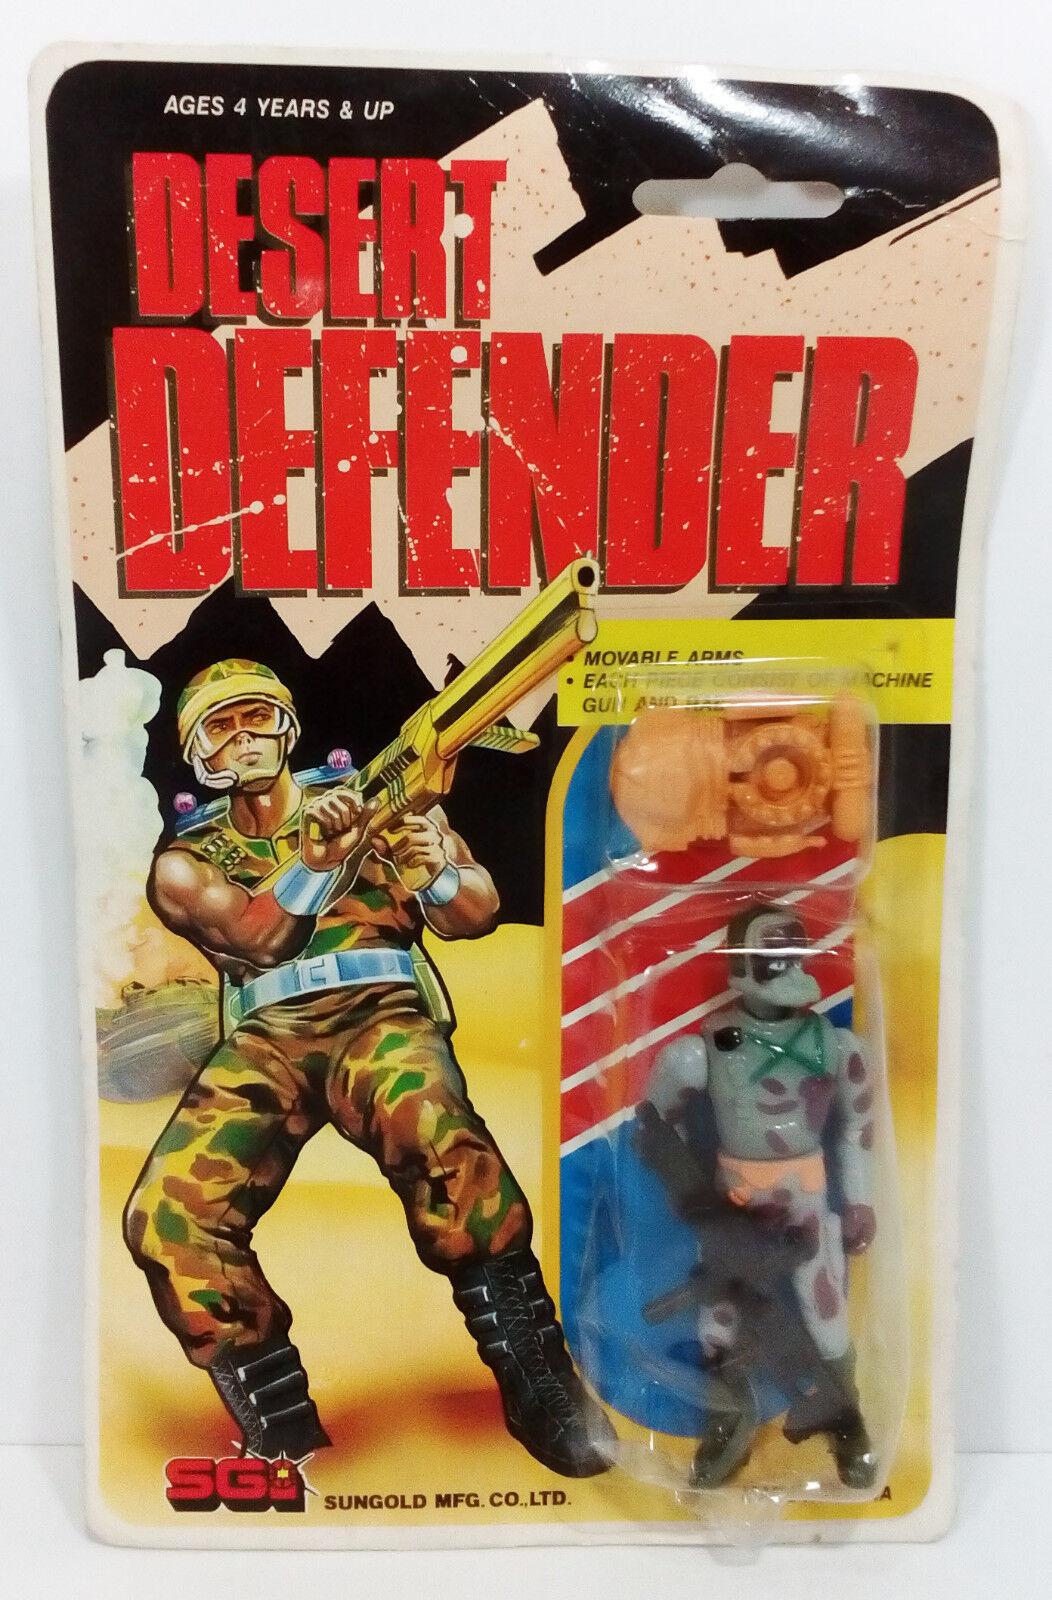 VTG 80'S GI JOE GIJOE KO DESERT DEFENDER ACTION FIGURE SGI SUNgold MOSC MOC 3